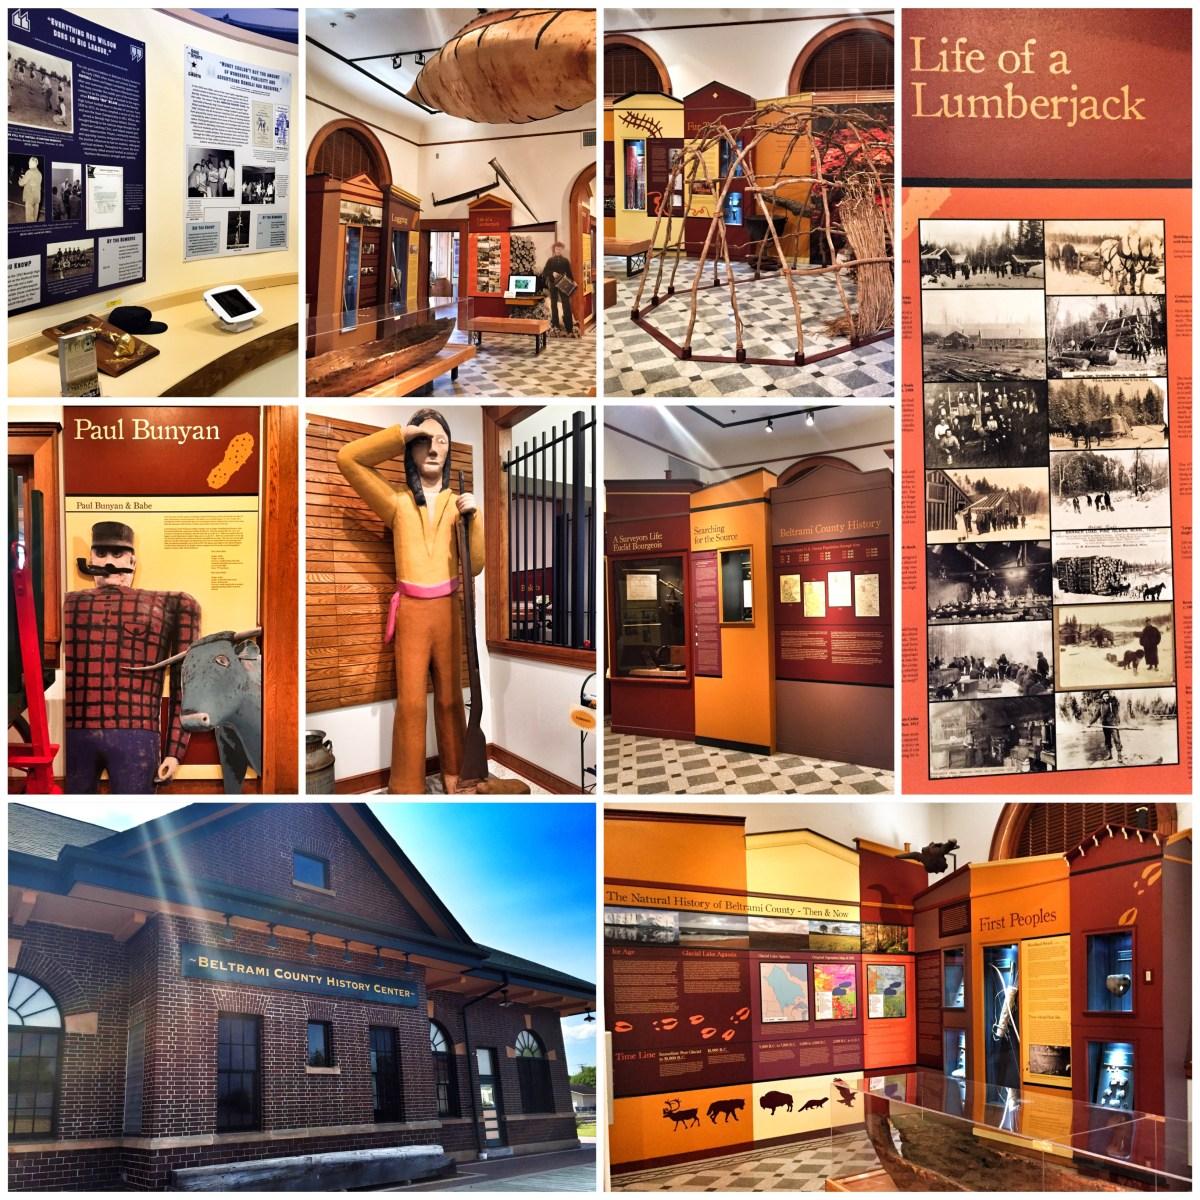 Beltrami County History Center